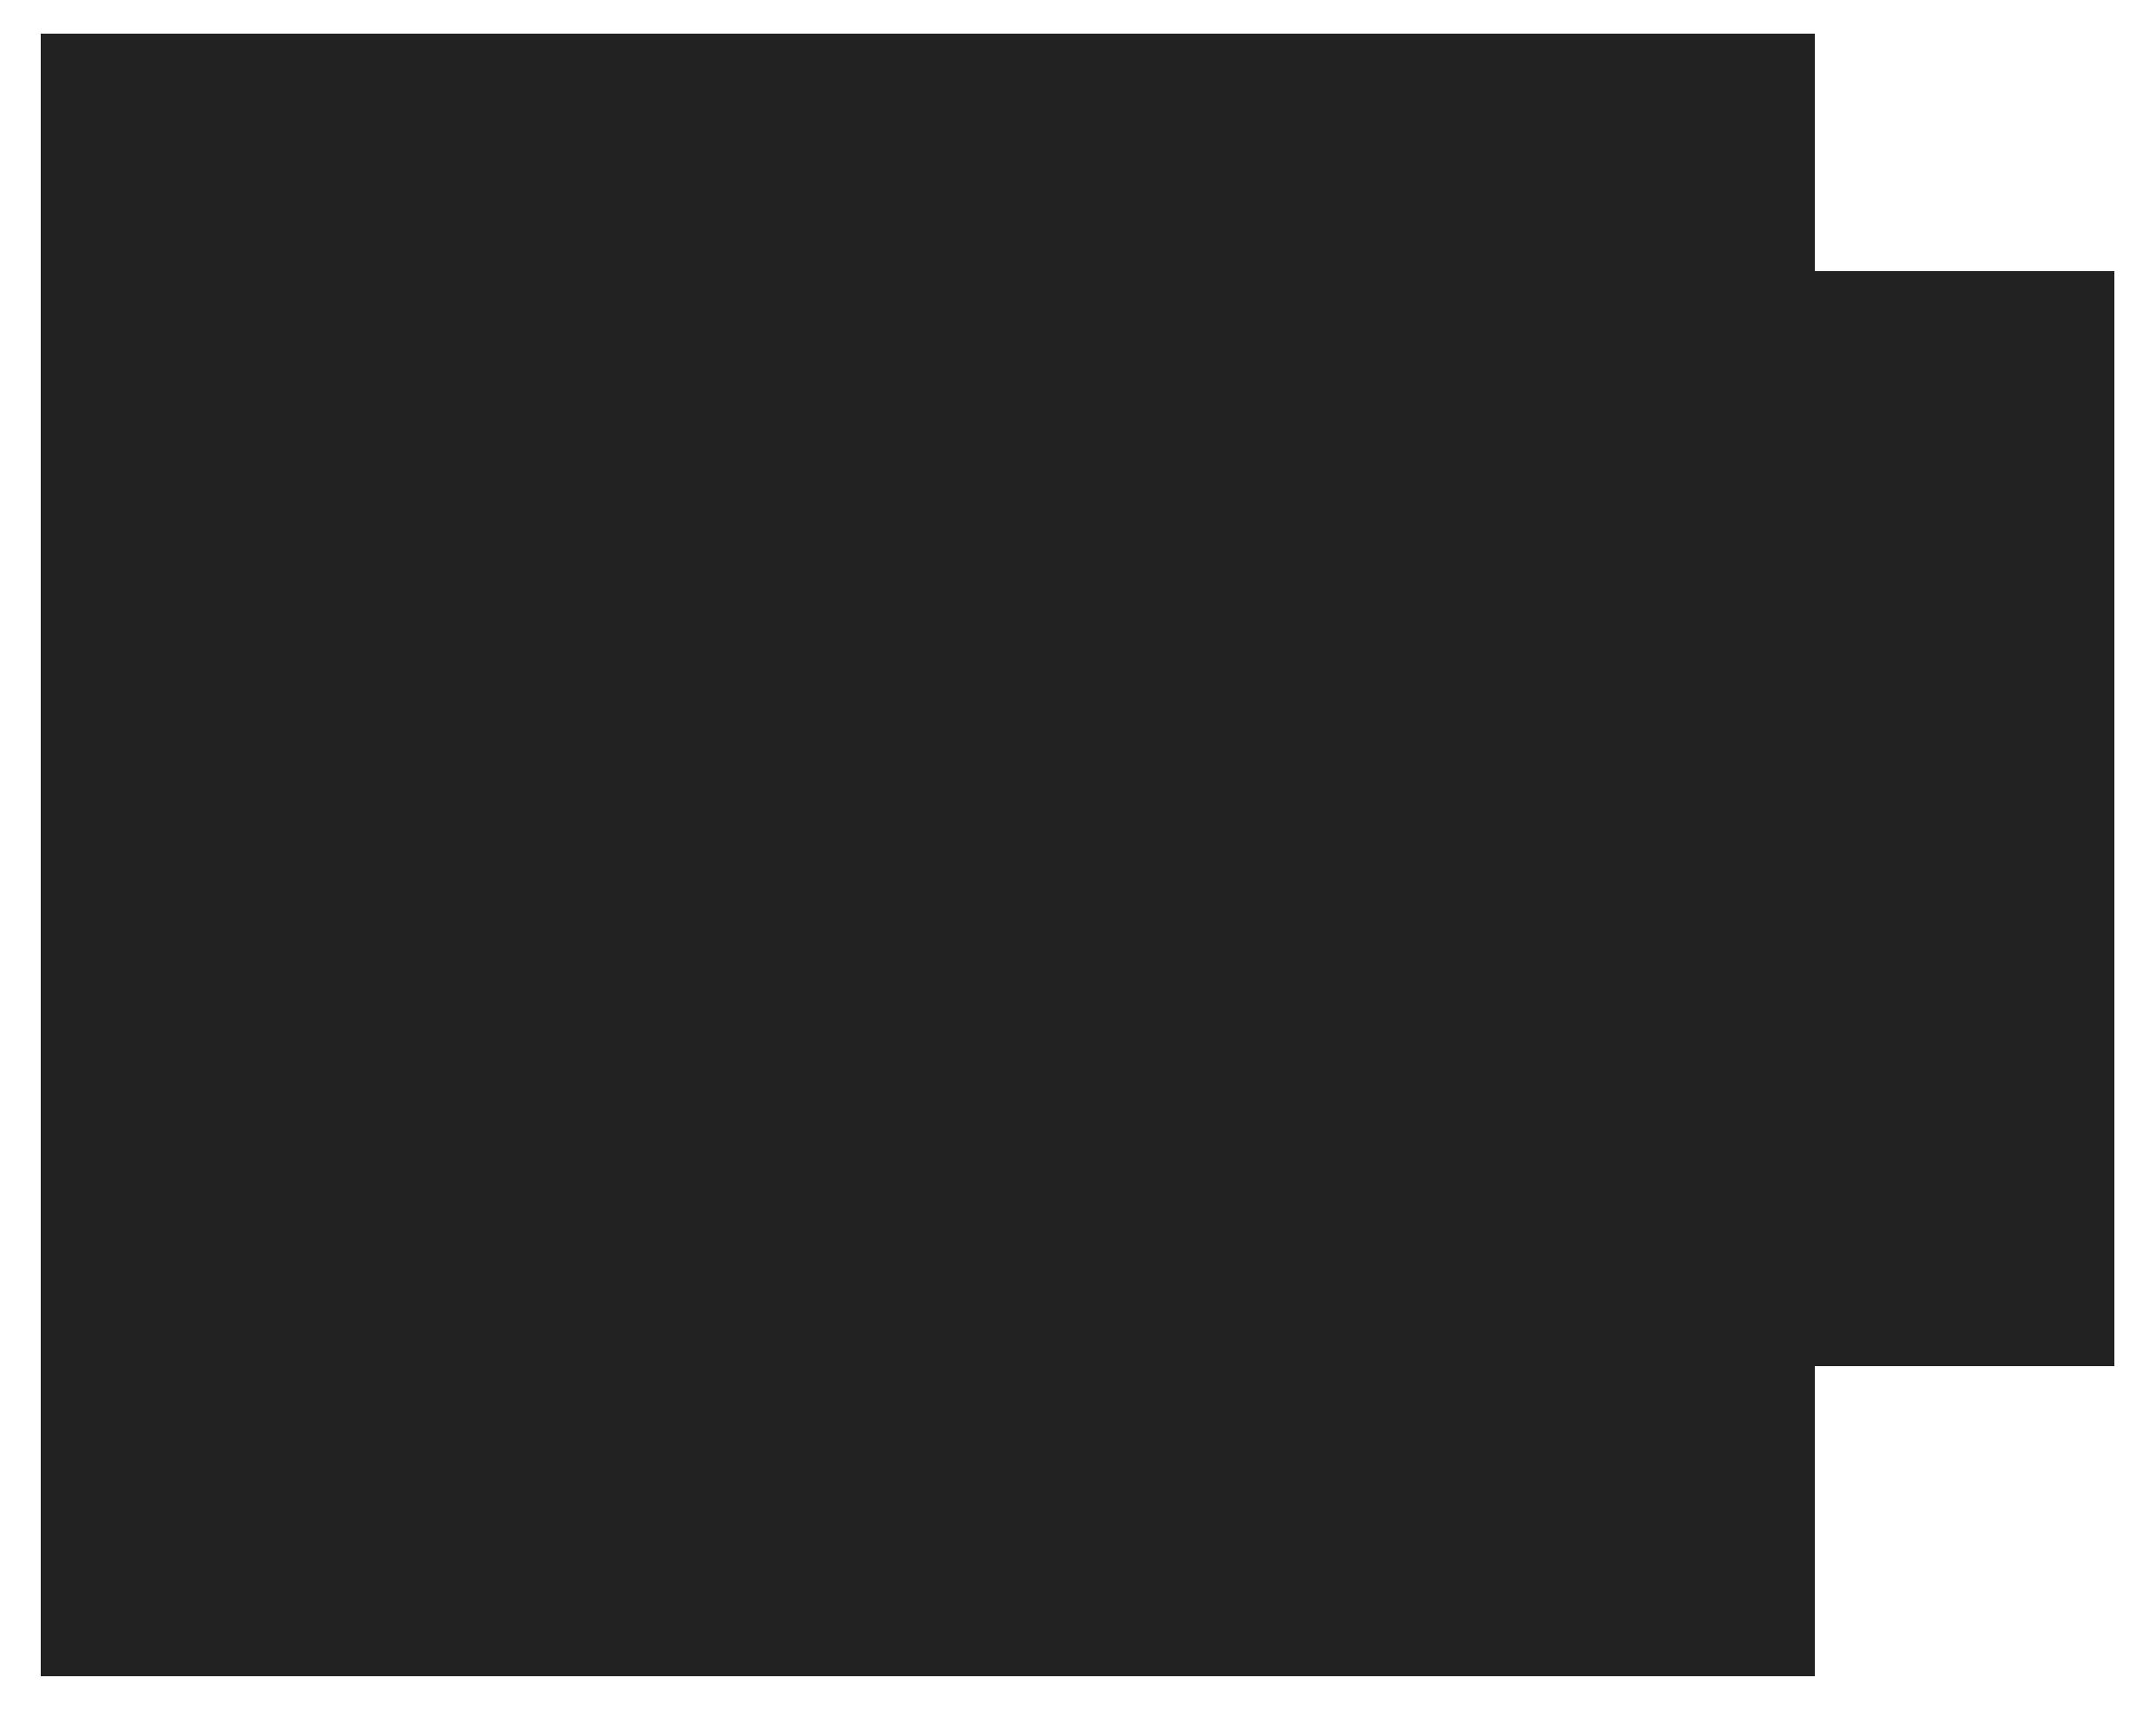 4d3b2dee166 Pando Design – Multimedia Marketing